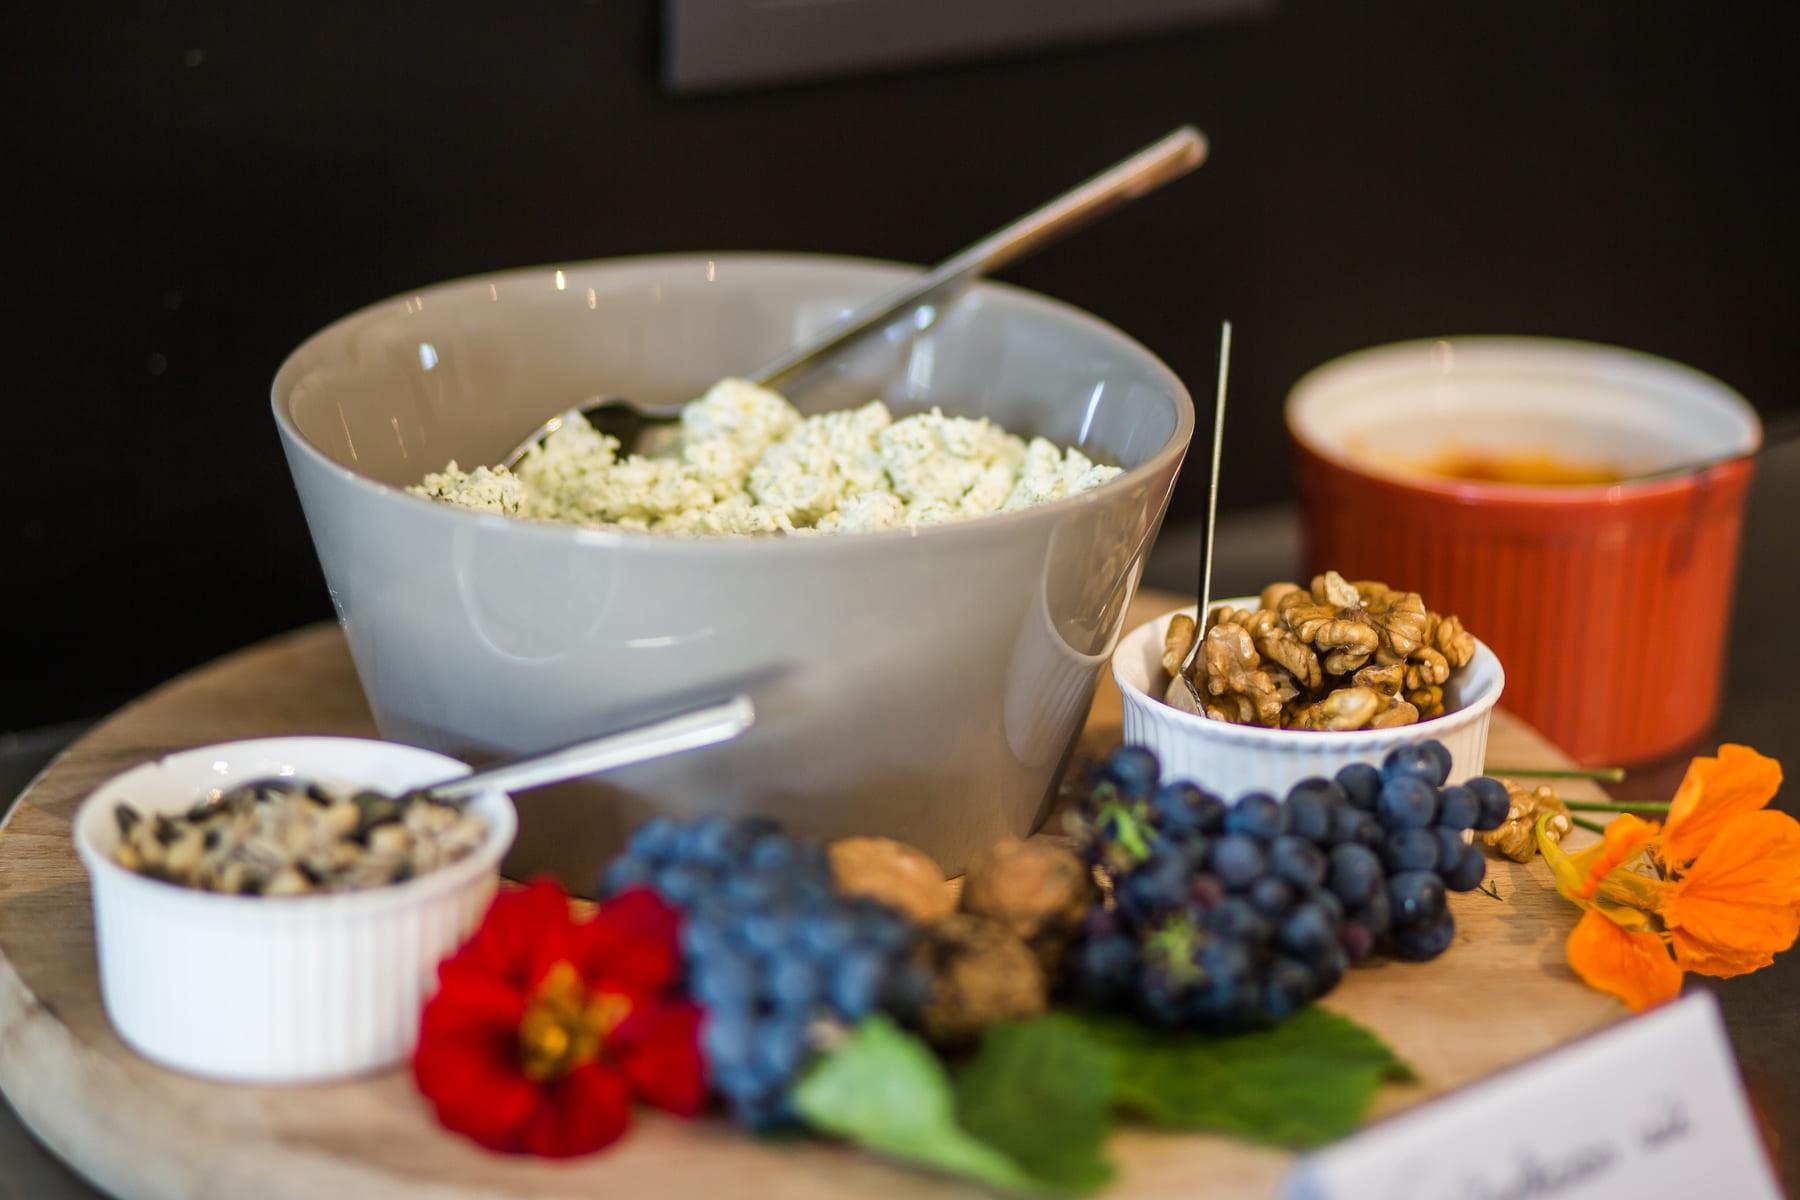 Kasteelhoeve Wange faciliteiten ontbijt eten Landen